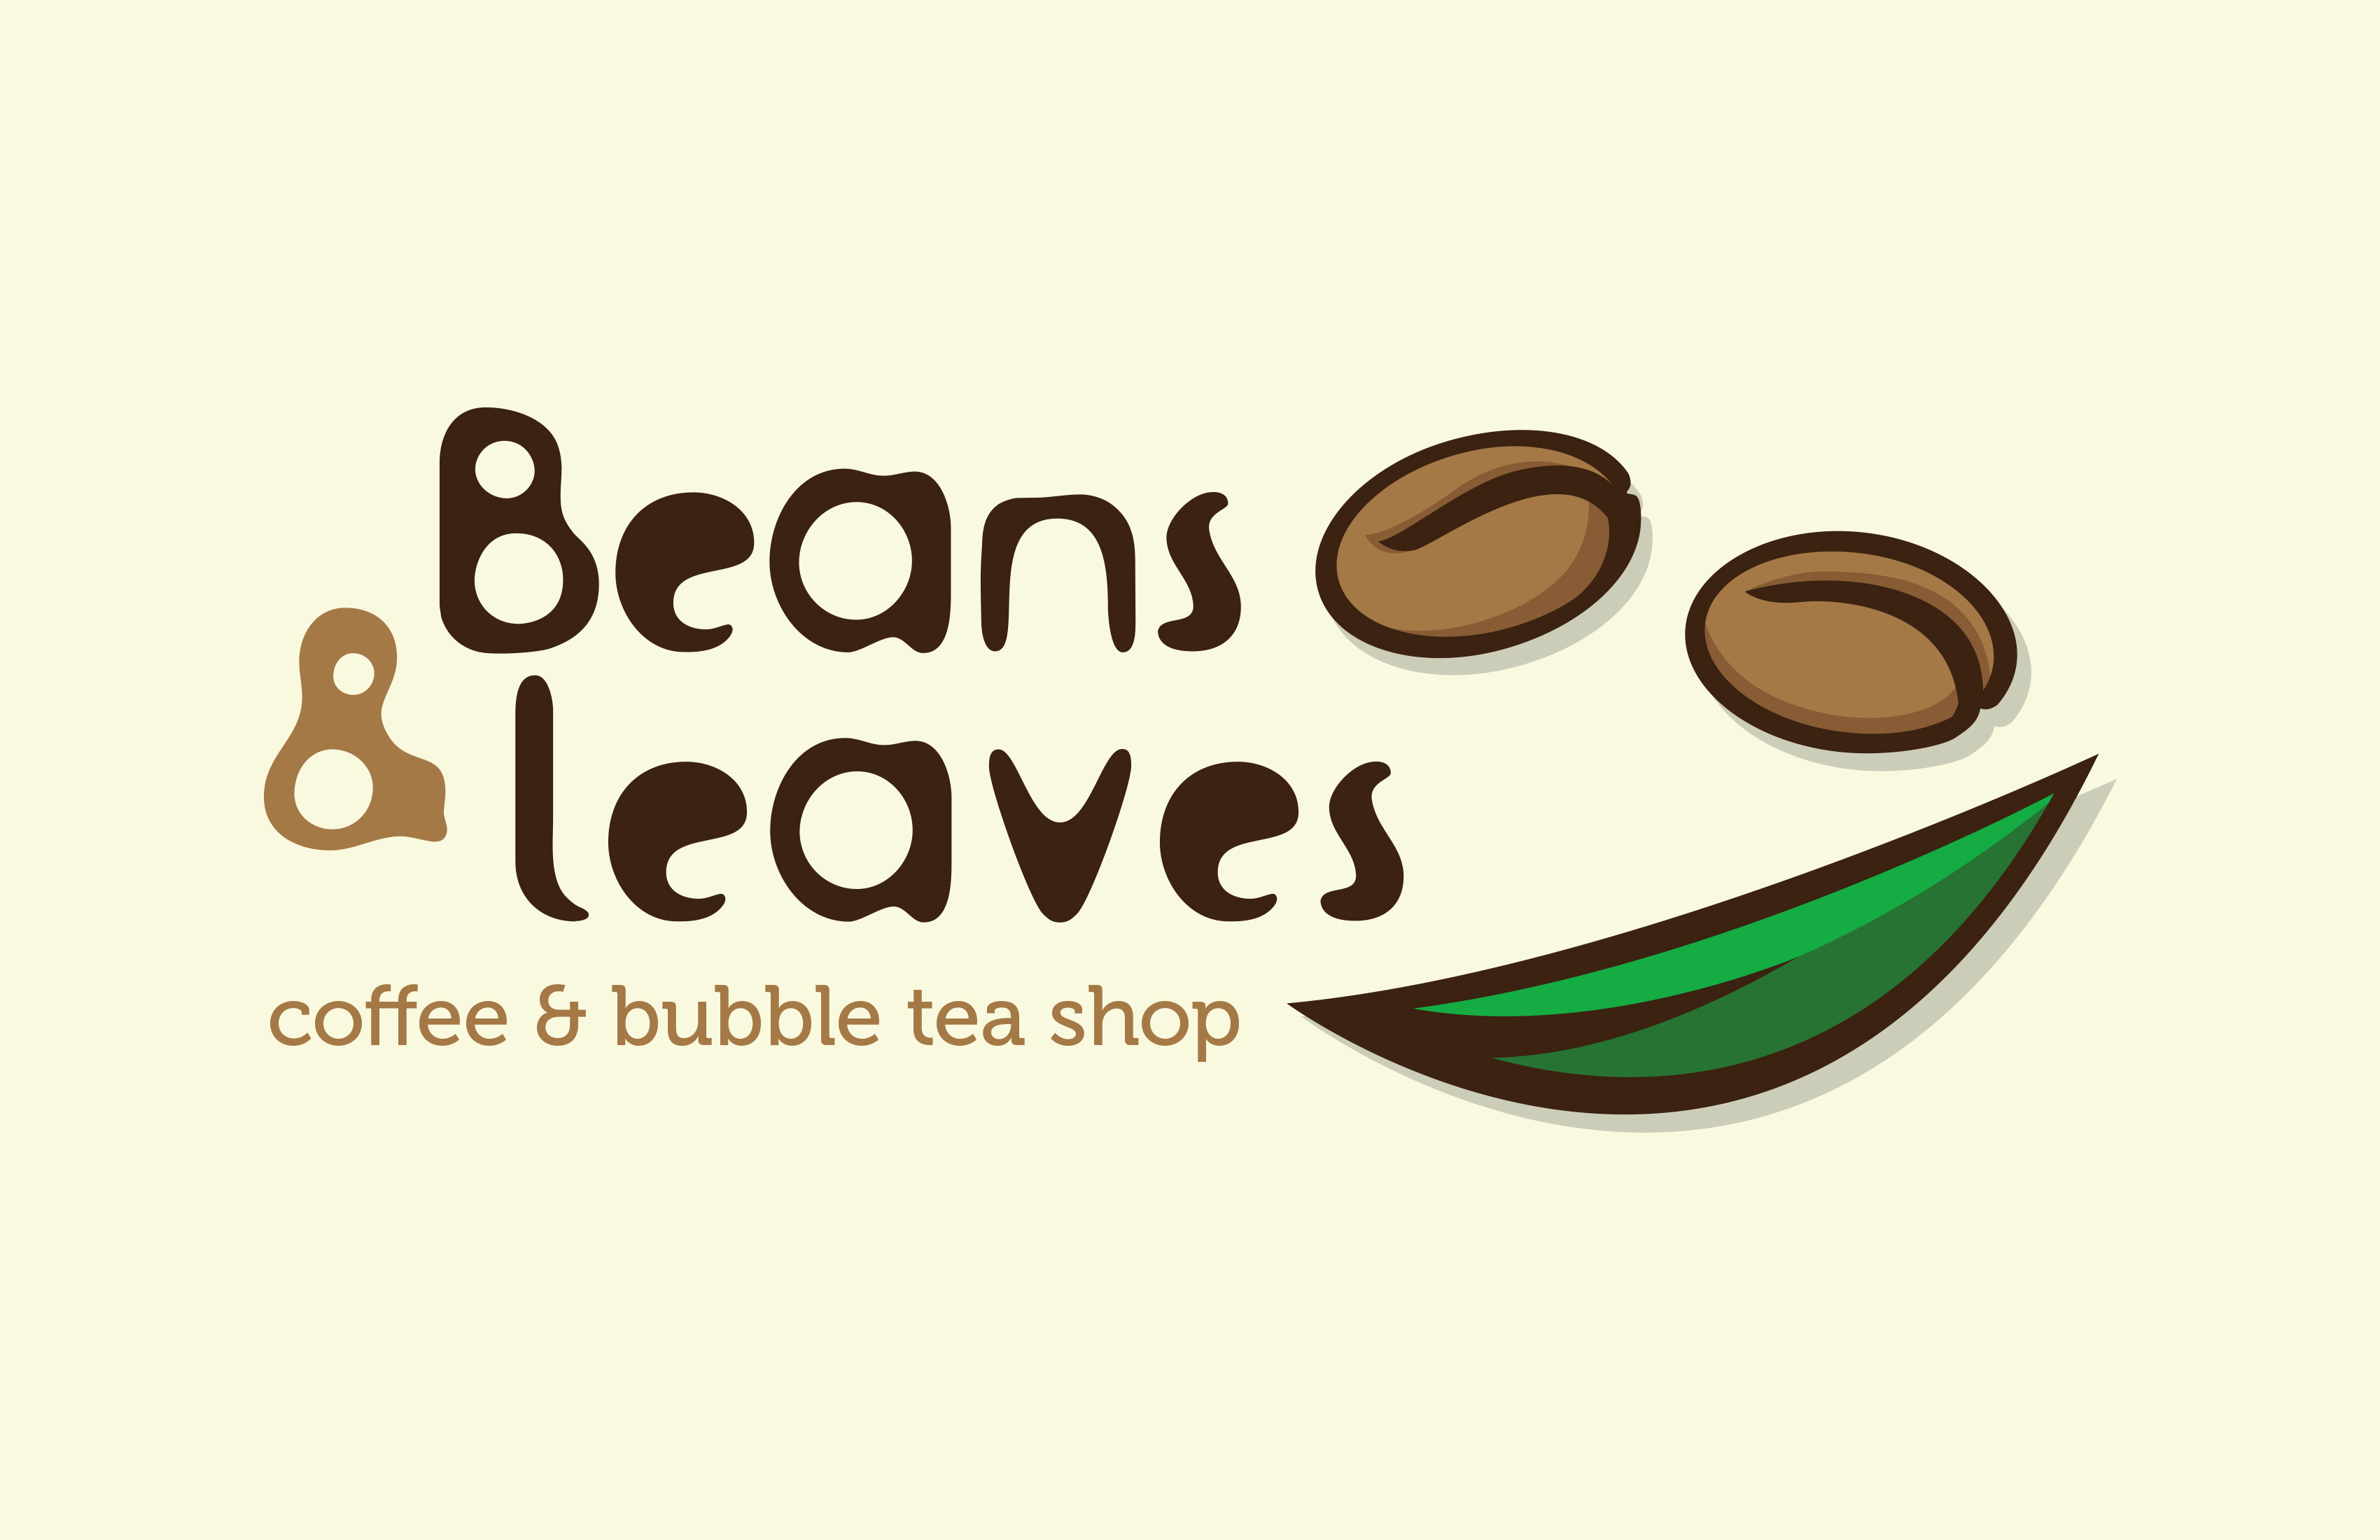 Beans & Leaves